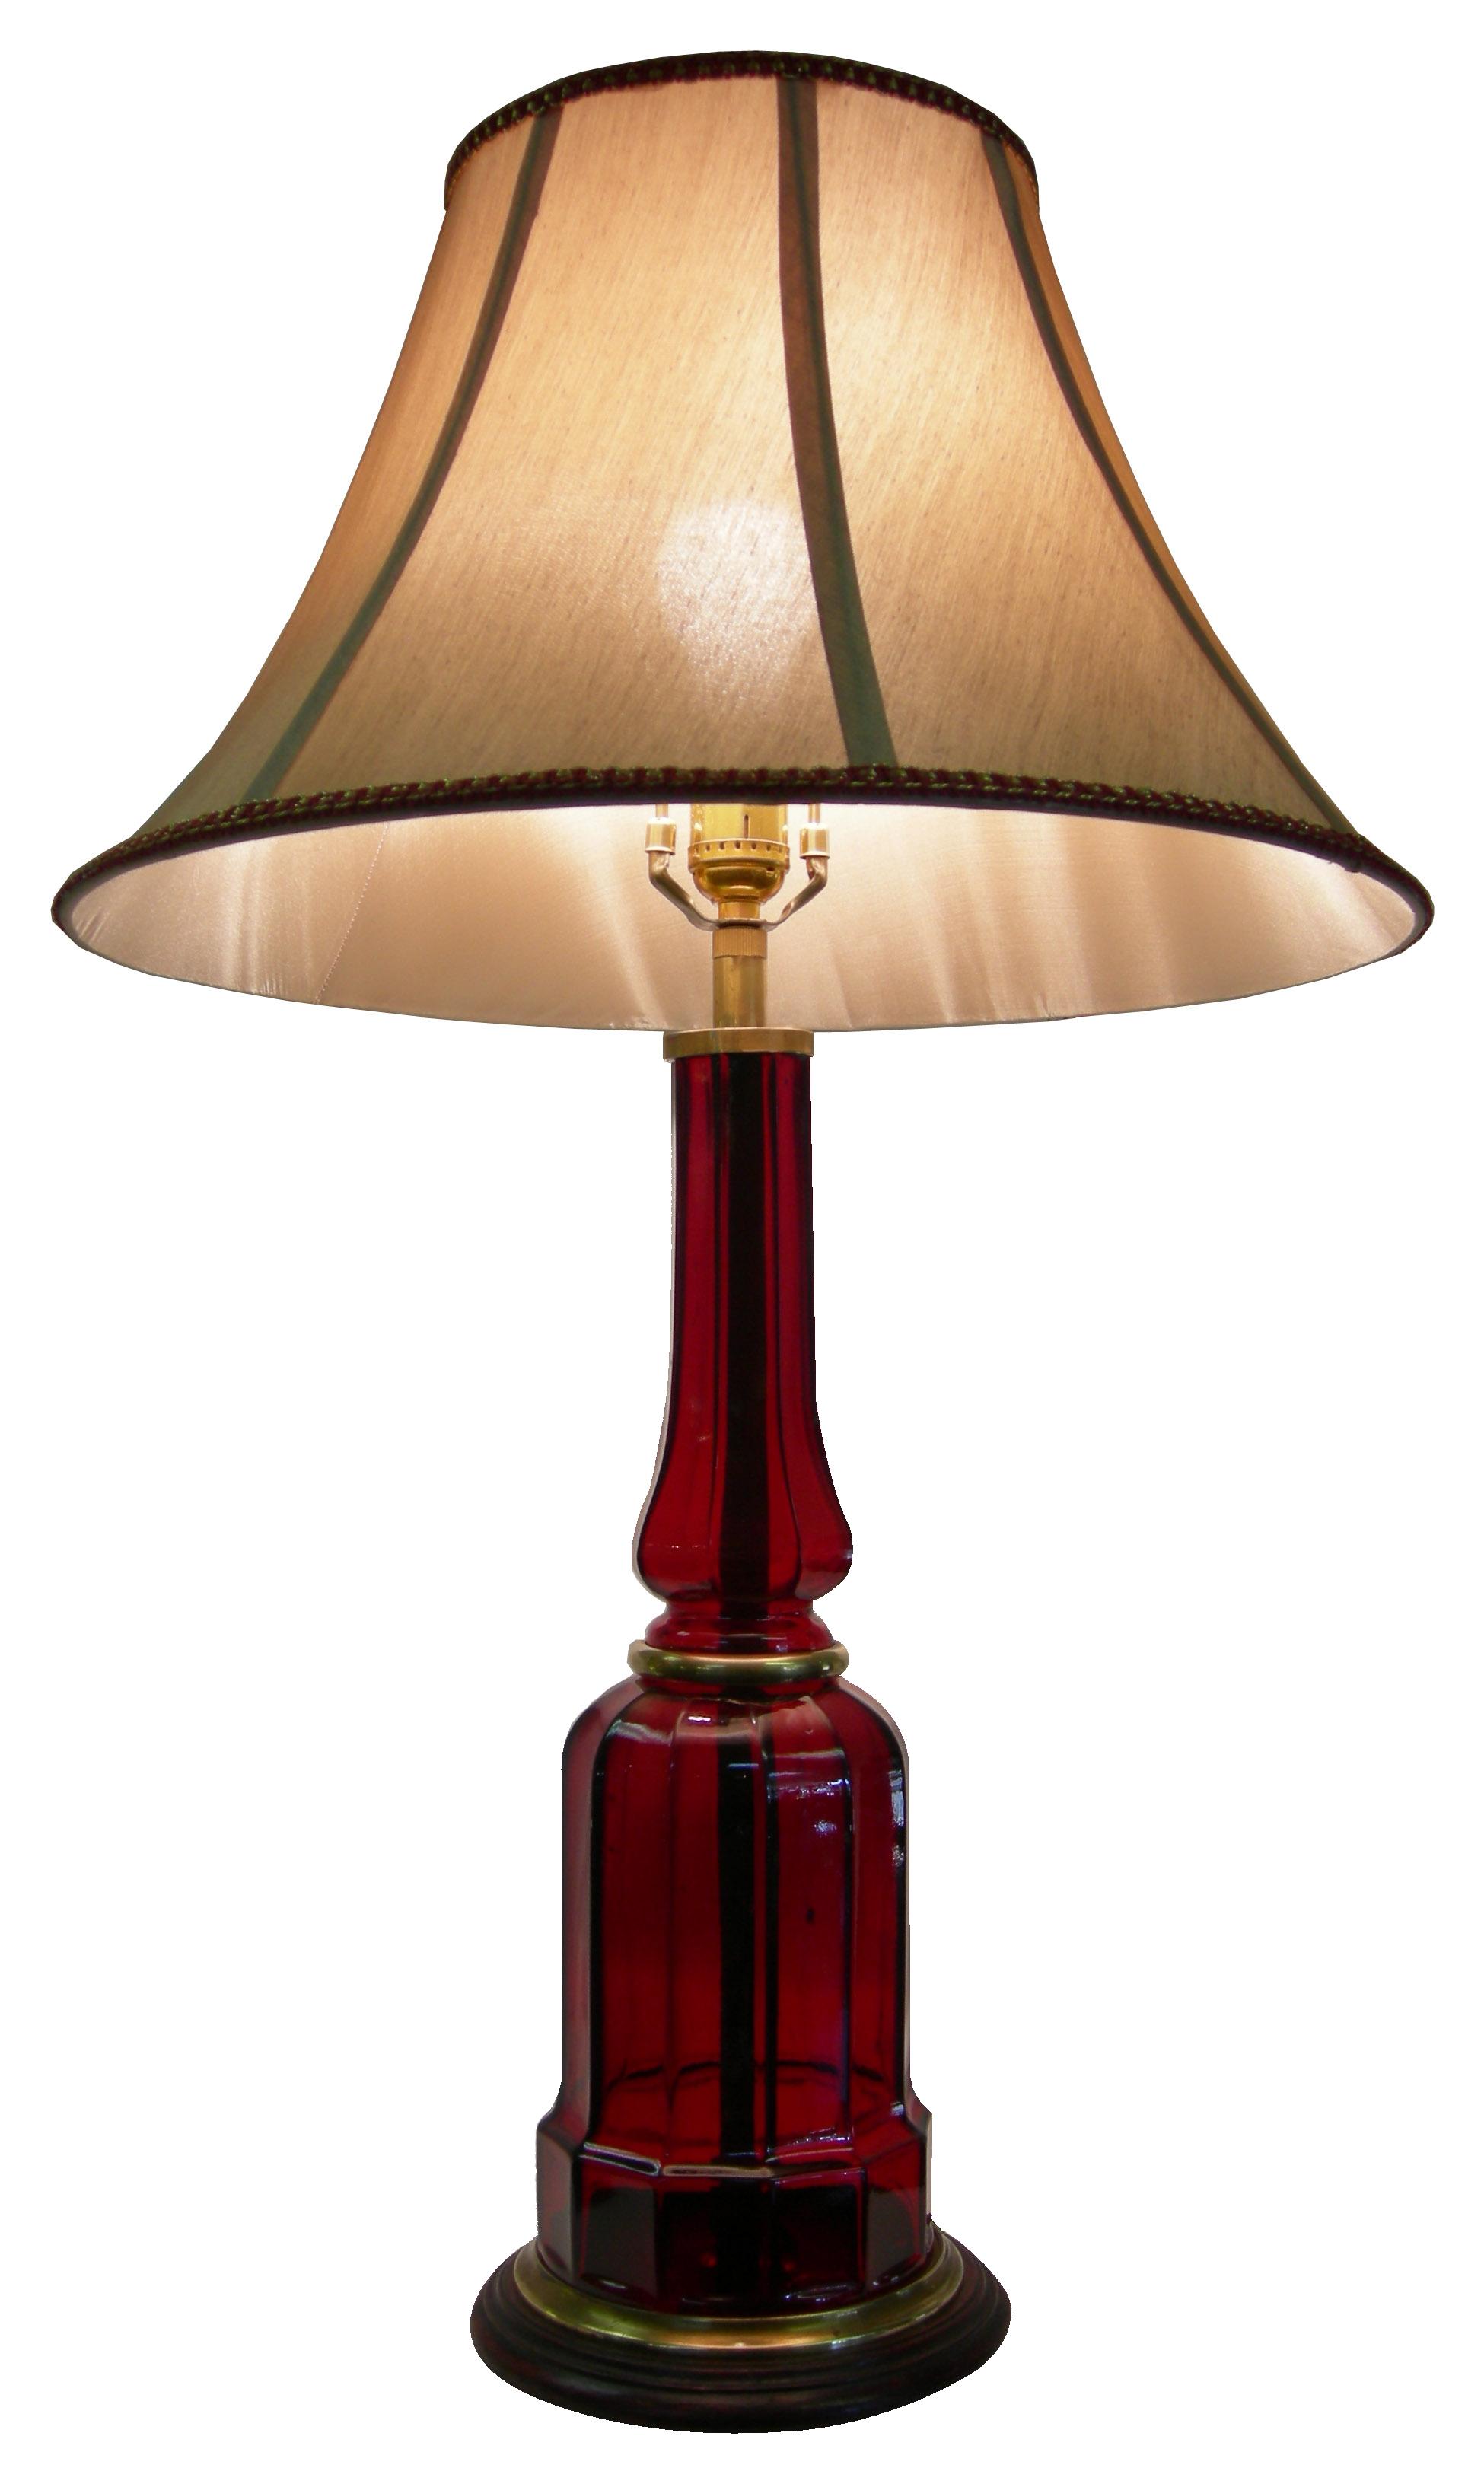 Download PNG Image   Lamp Image 546